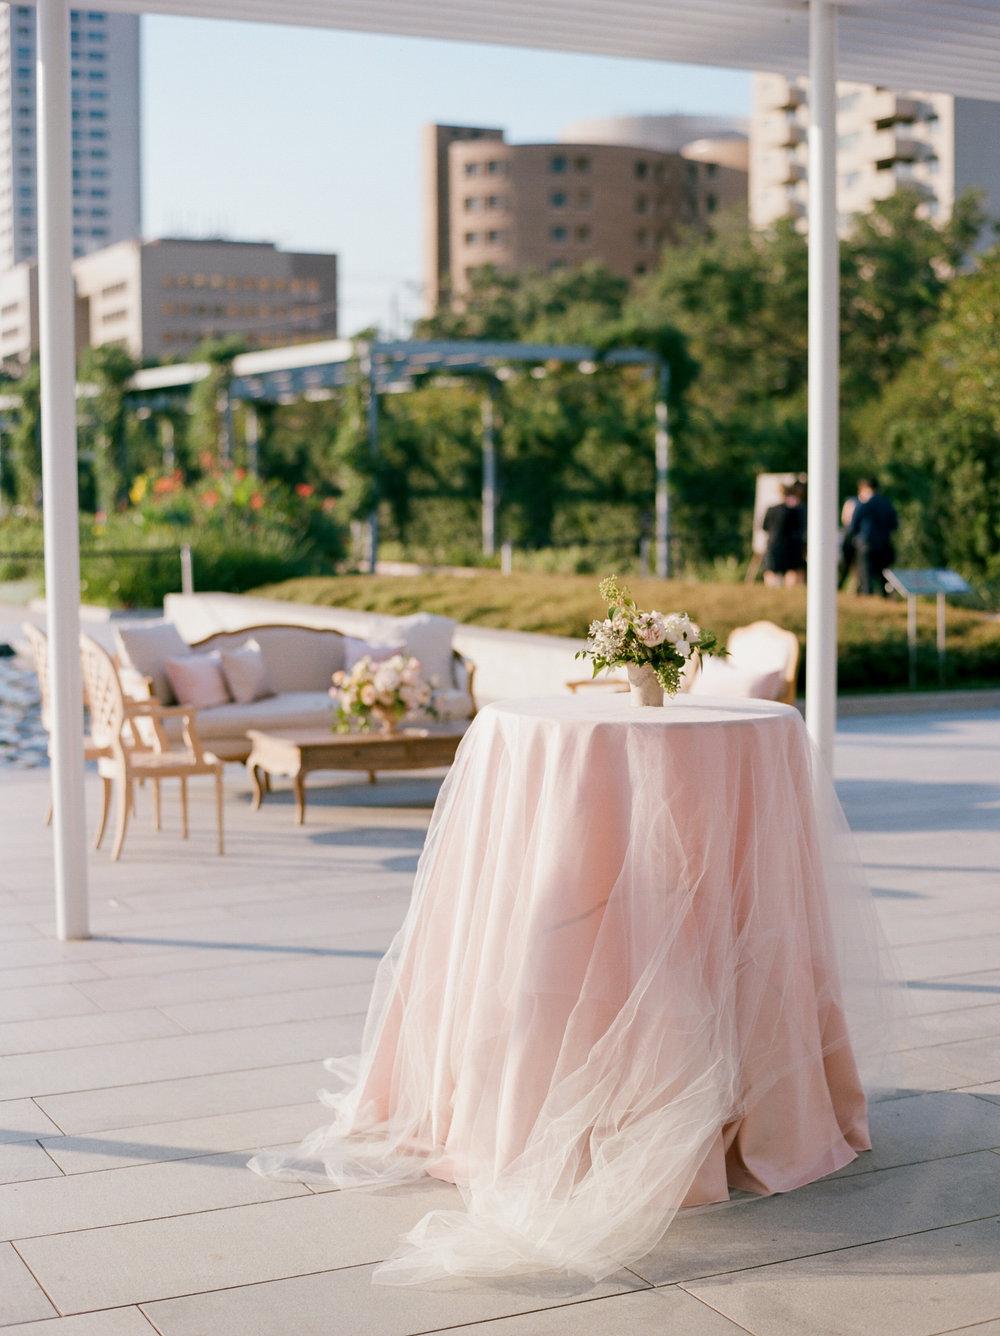 Martha-Stewart-Wedding-Dana-Fernandez-Photography-Josh-Texas-Film-Houston-Wedding-Fine-Art-Photographer-McGovern-Centennial-Gardens-Top-Best-24.jpg